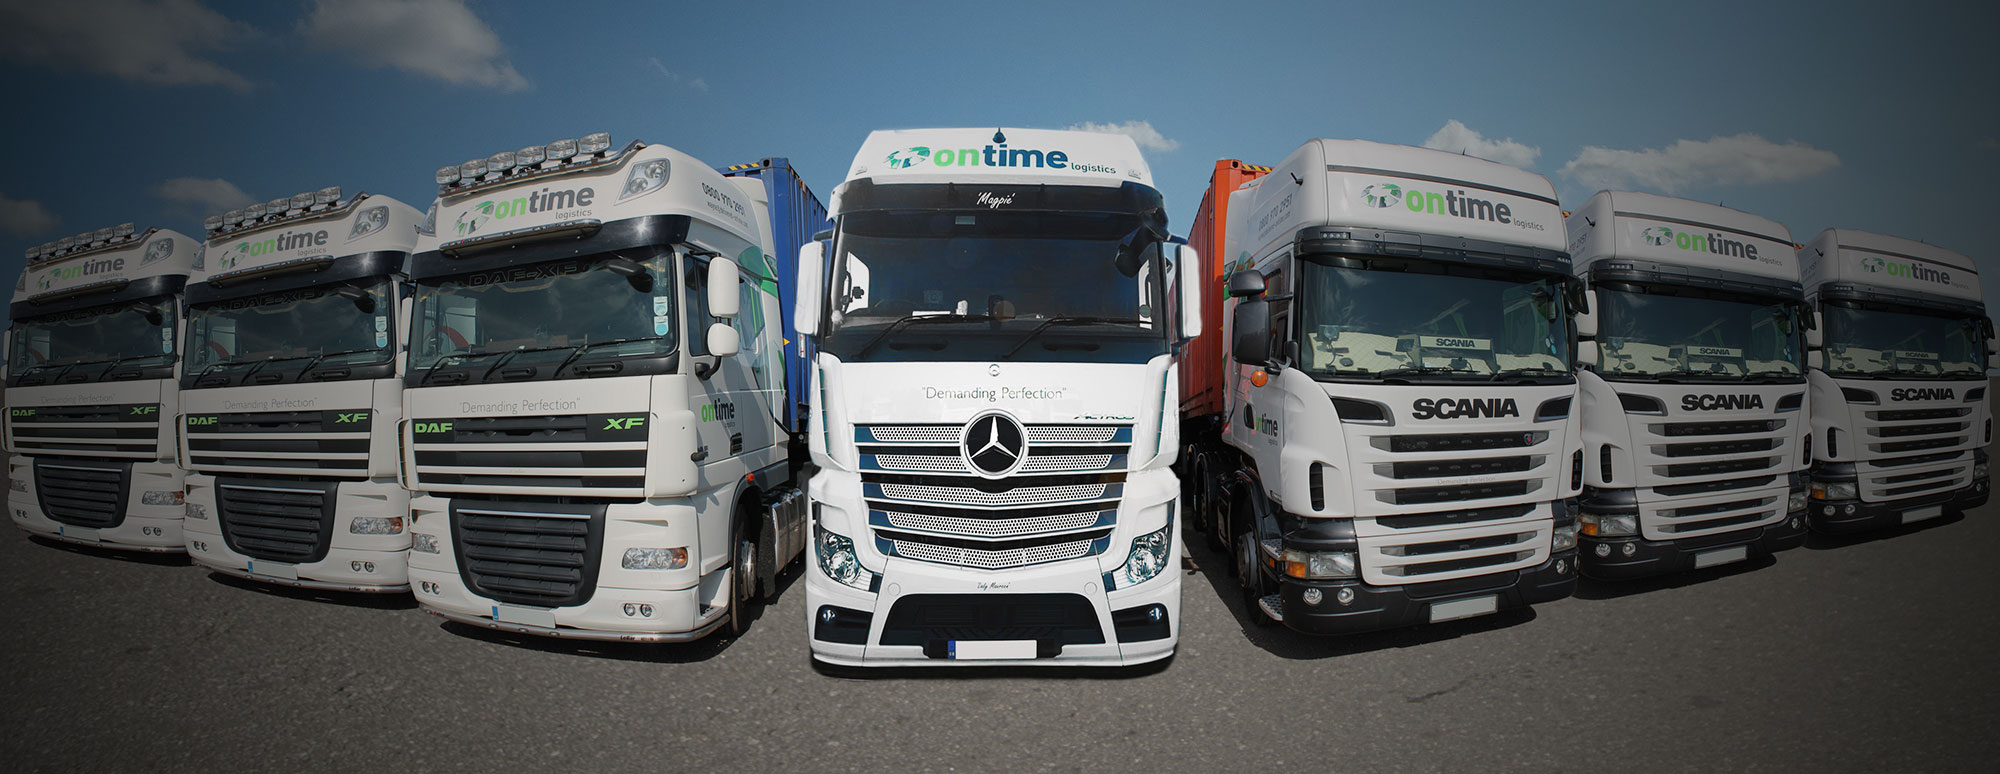 ontime transport and logistics